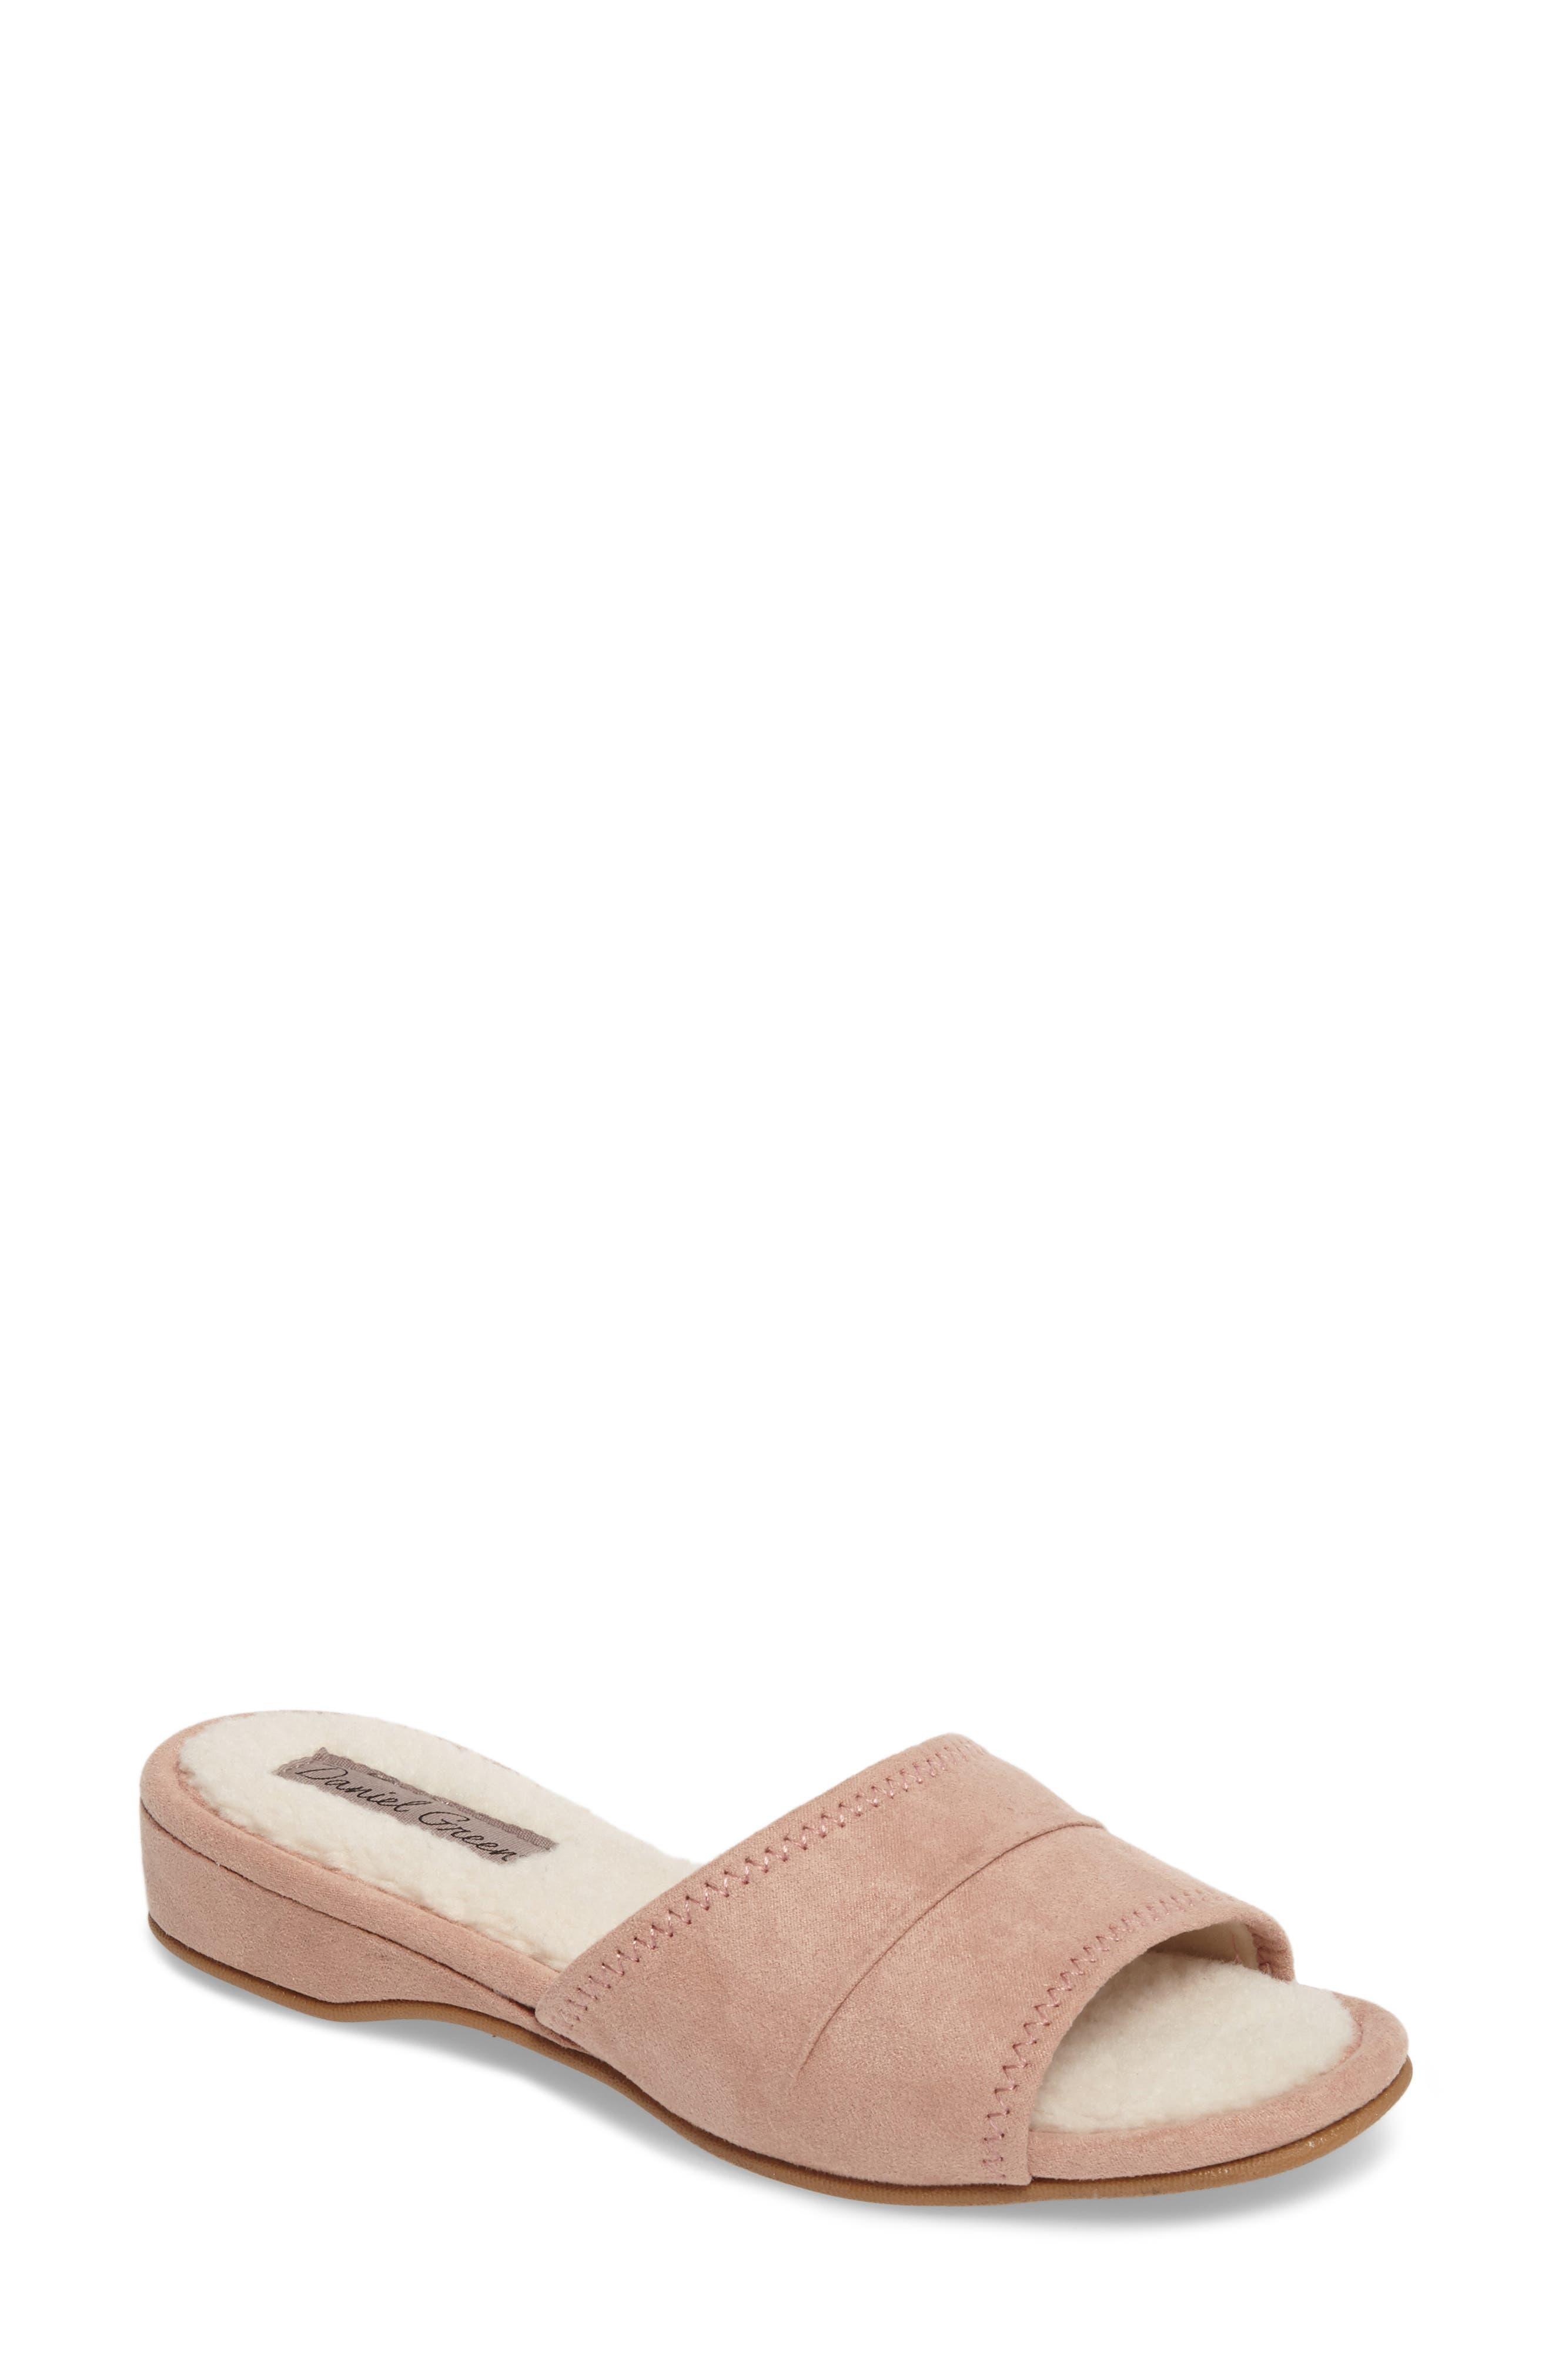 'Dormie' Slipper,                         Main,                         color, Rose Suede